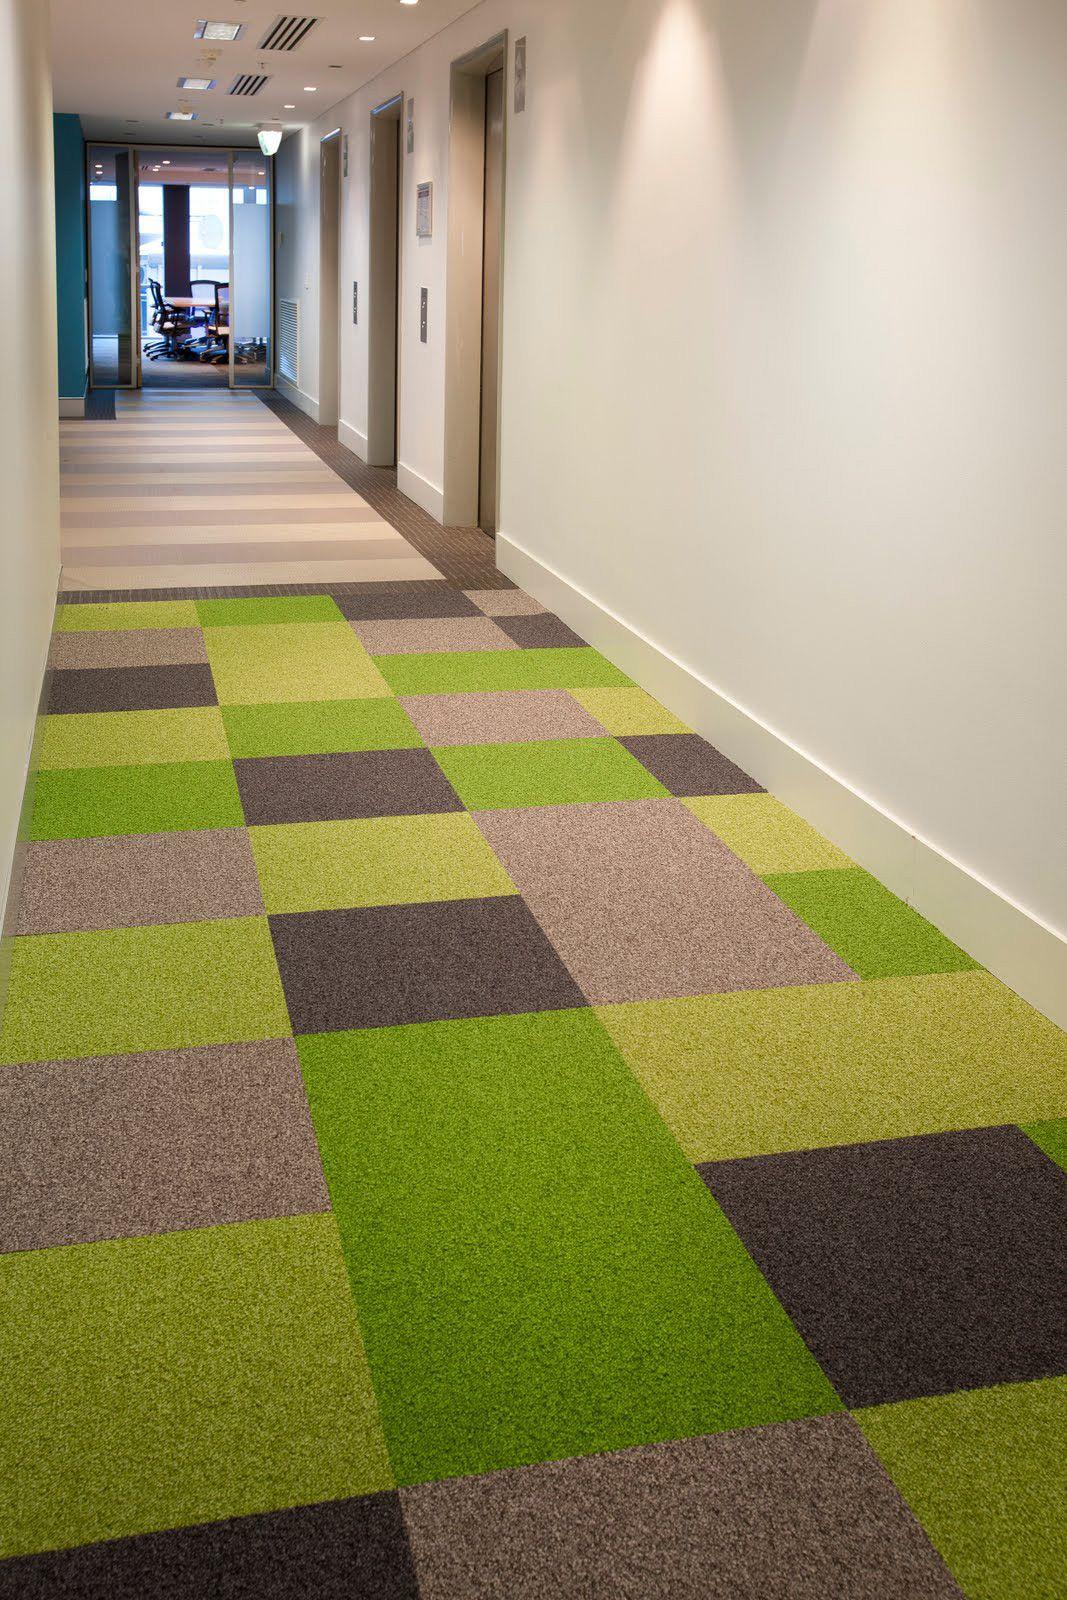 Cheap Carpet Tiles Carpet Tiles Office Carpet Tiles Carpet